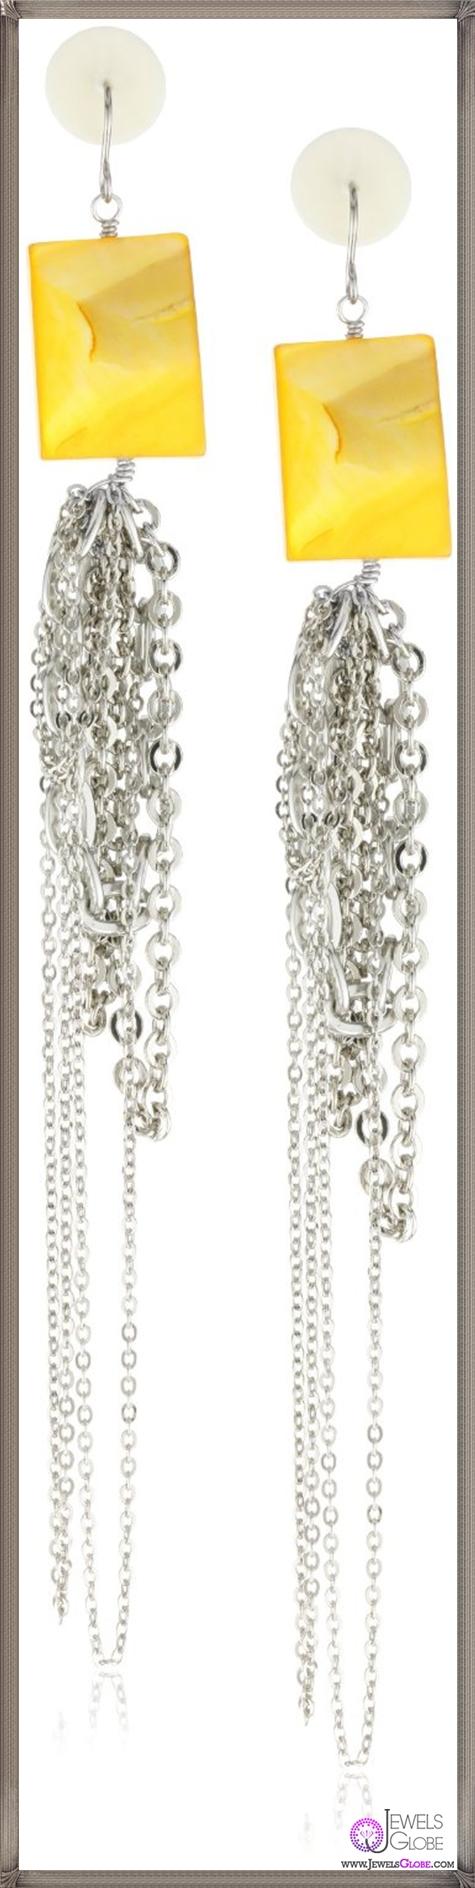 Gemma-Redux-Golden-Paua-Shells-Kellie-Earrings Important Gemma Redux Jewelry Pieces to Look For